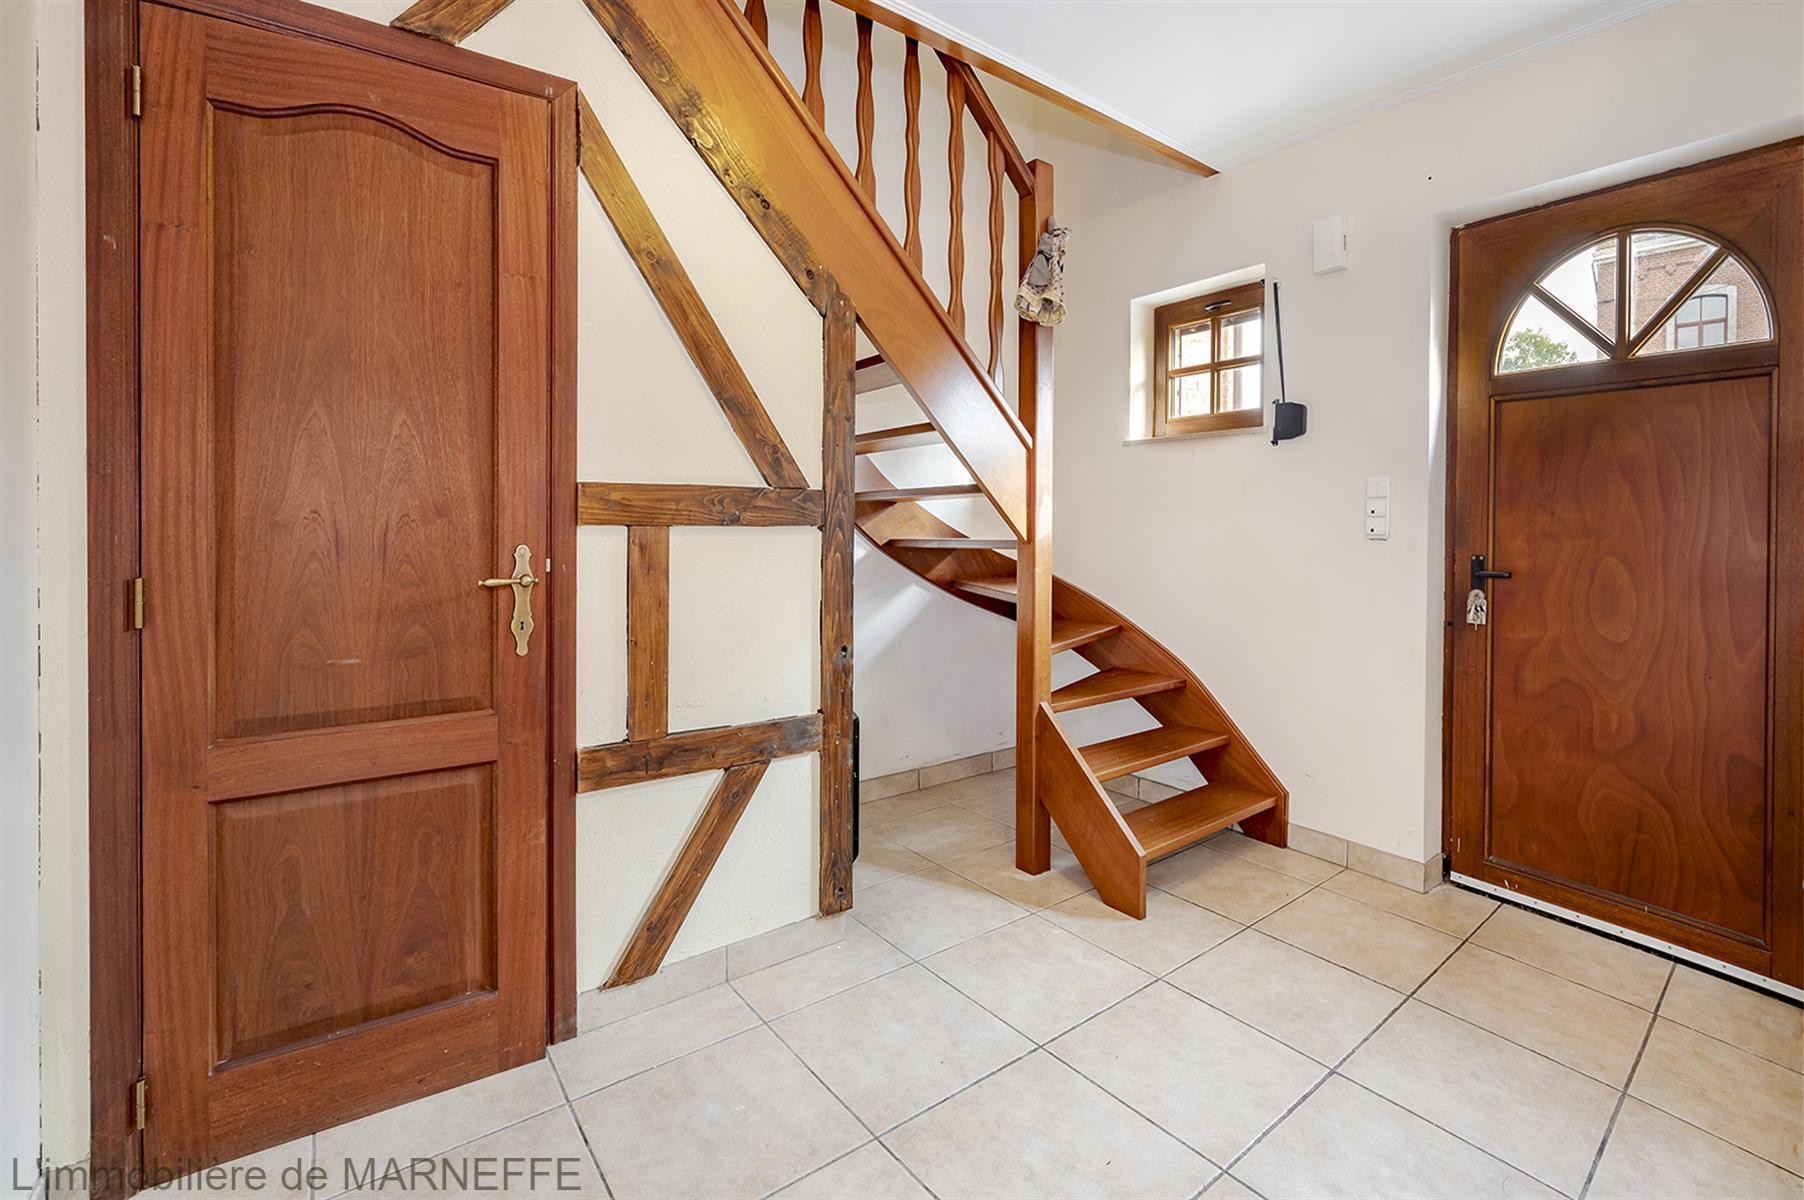 Maison - Donceel - #3855303-4